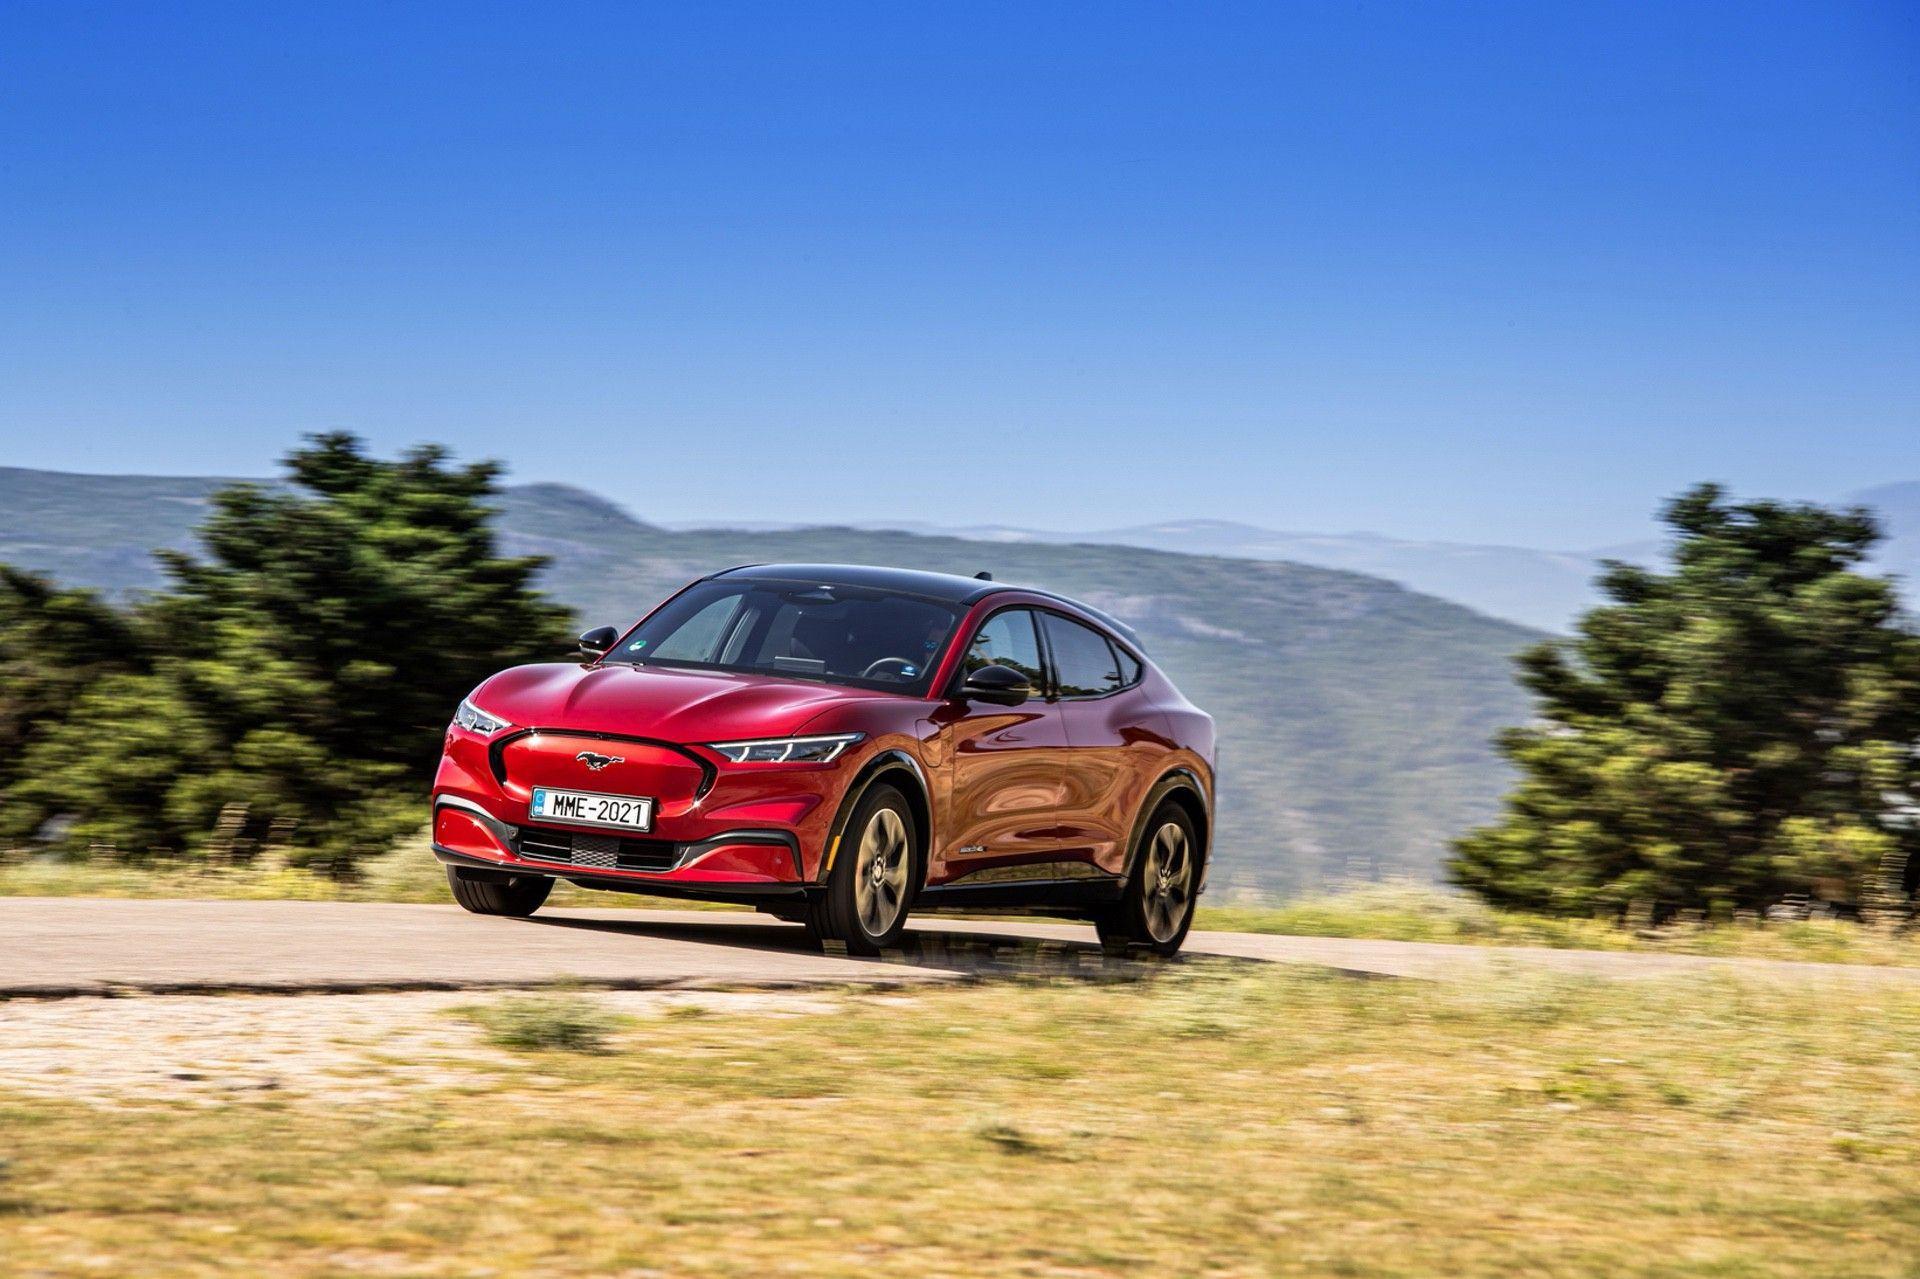 Ford_Mustang_Mach-E_greek_presskit-0136